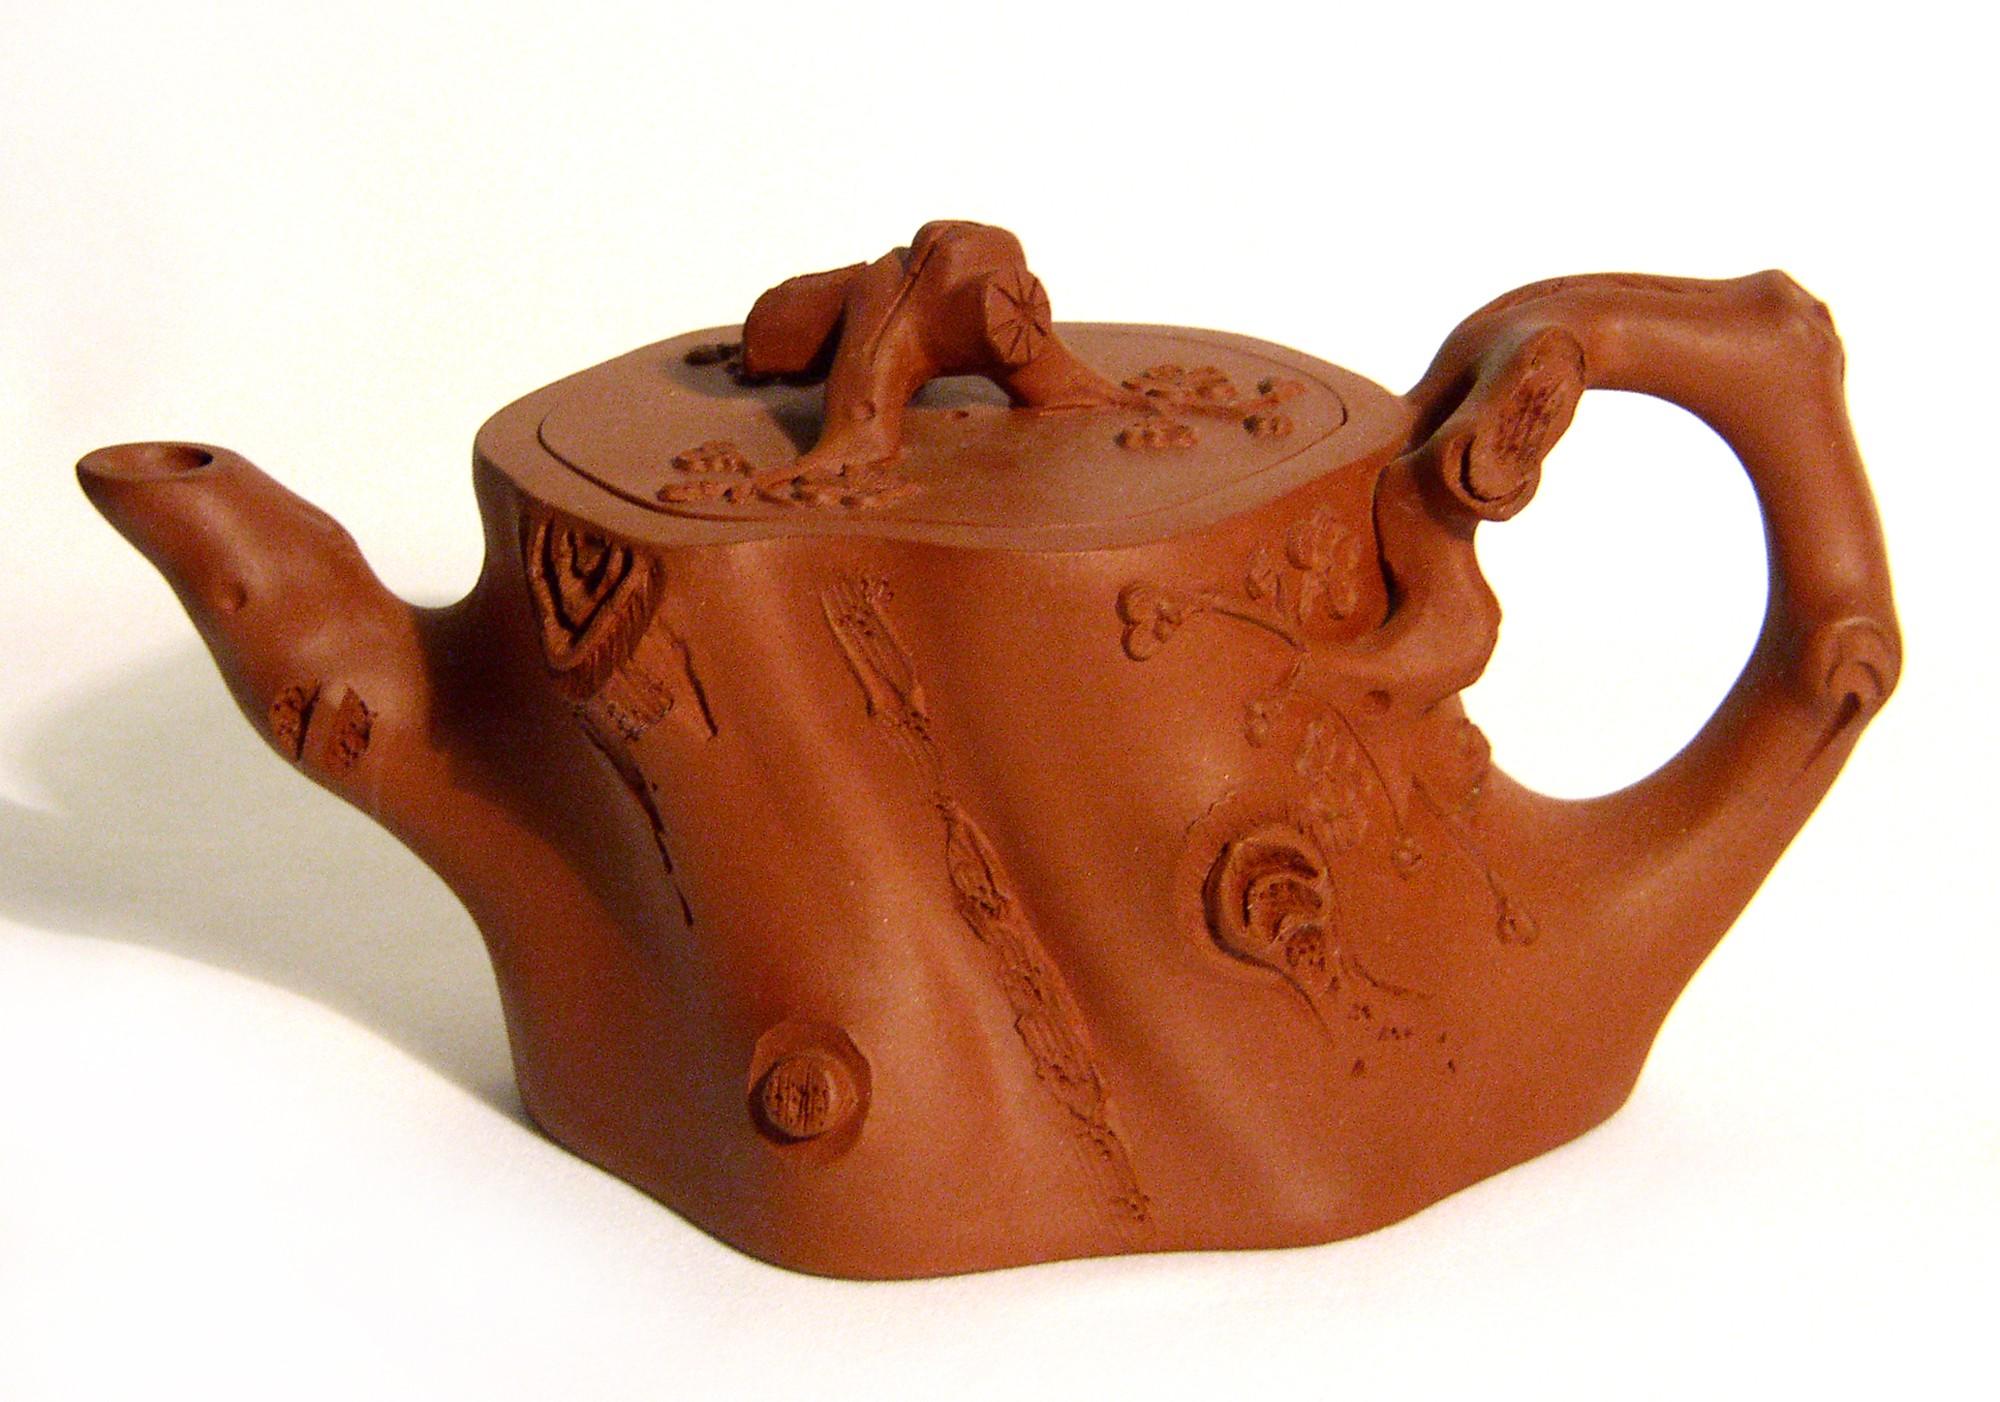 Yixing / Purple Clay Teapot - Tree Trunk